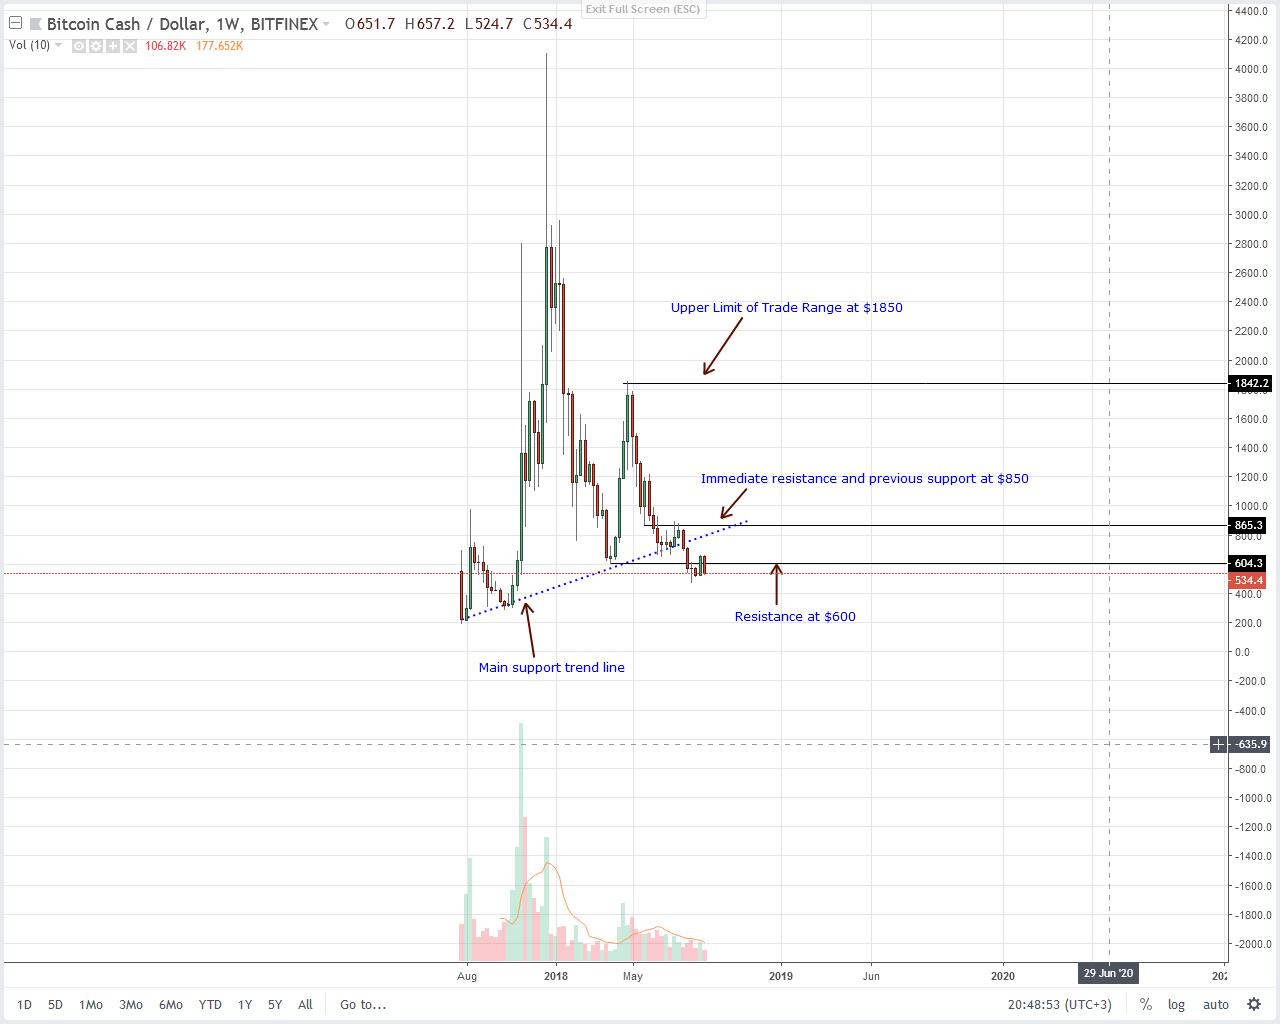 Bitcoin Cash Weekly Chart Sept 6